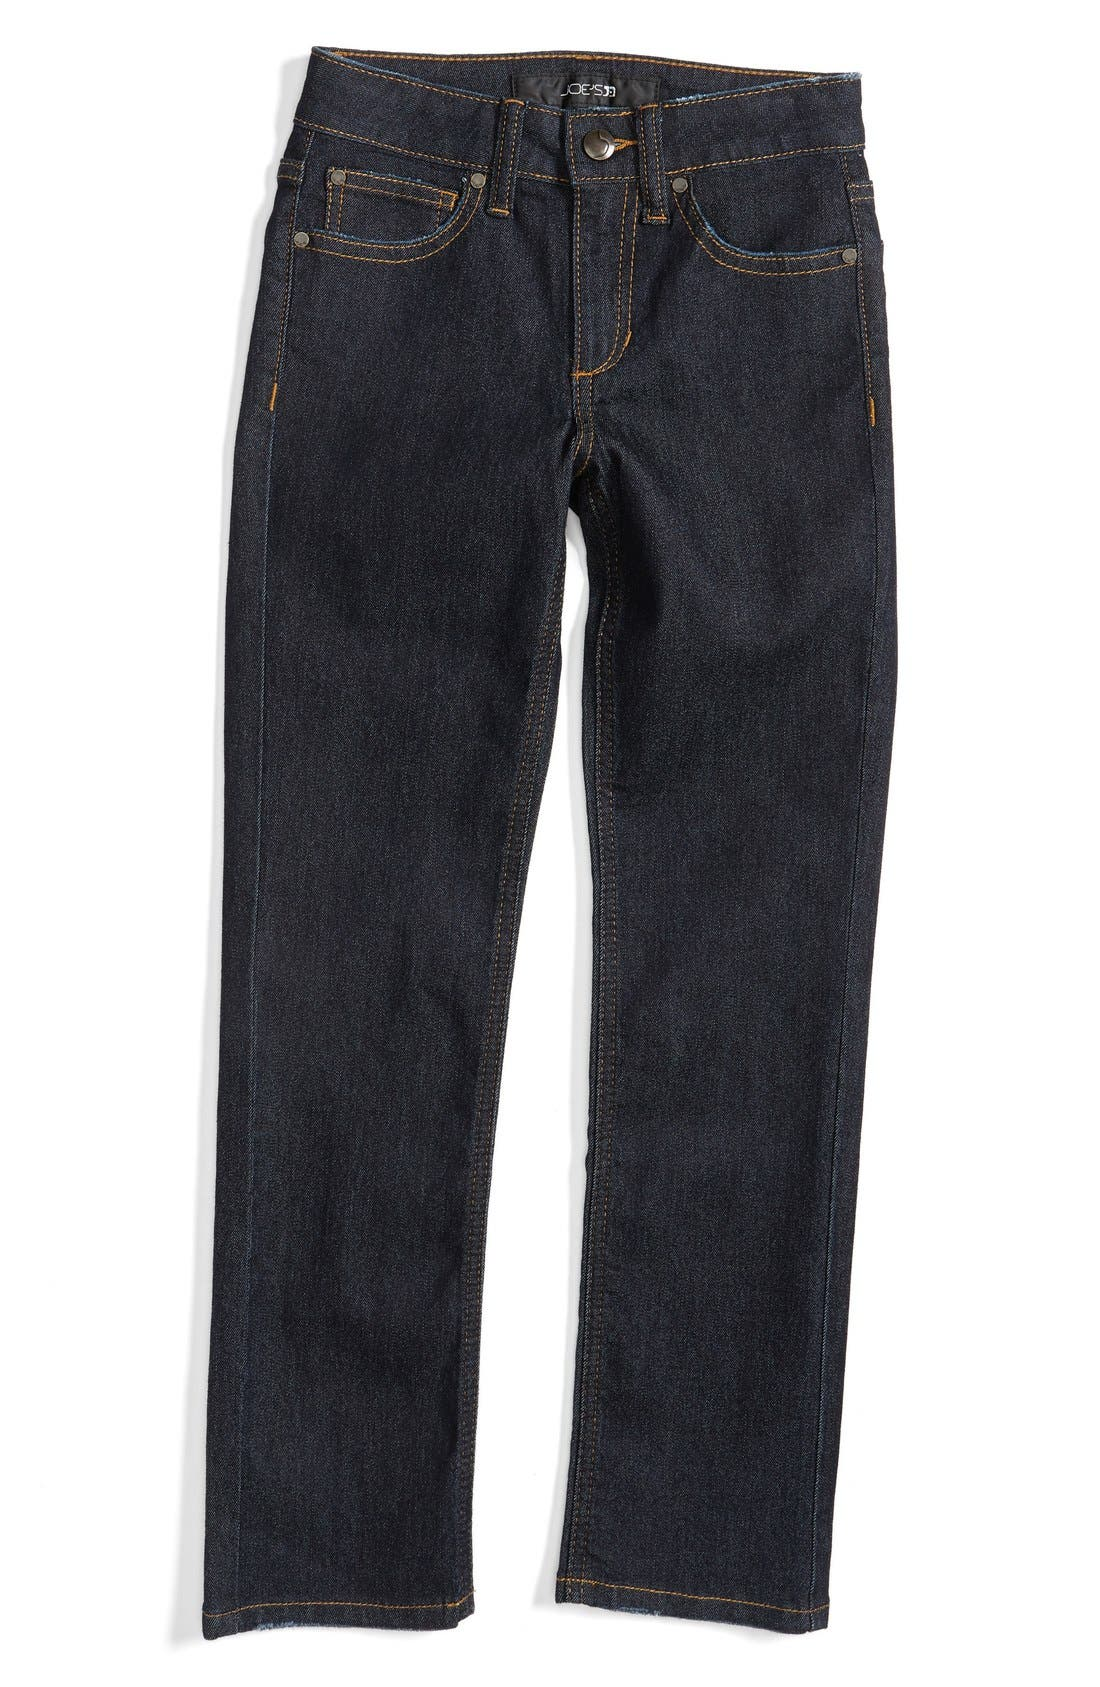 Brixton Straight Leg Jeans,                             Main thumbnail 1, color,